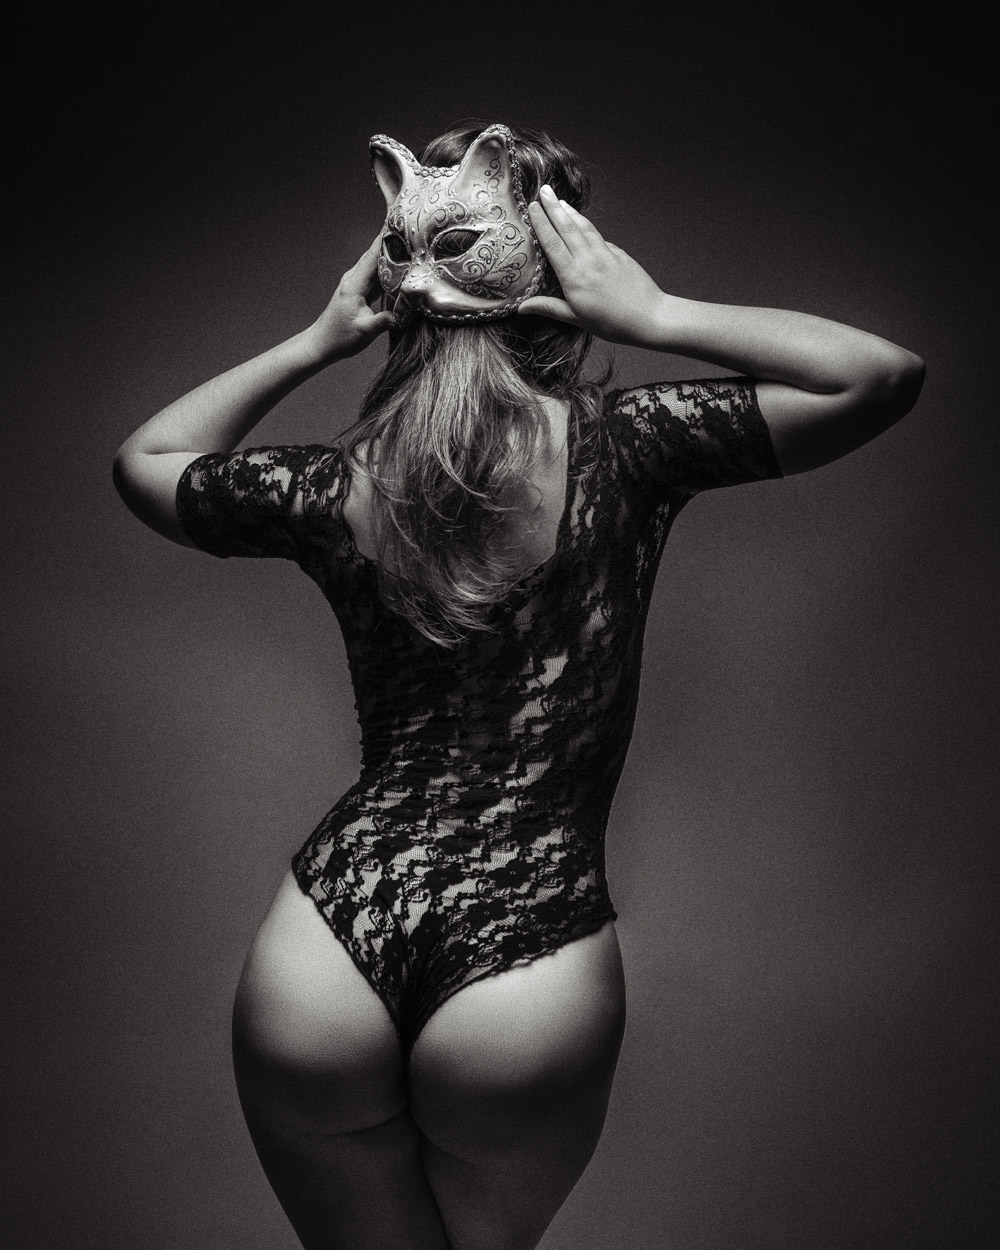 Behind the mask | Portraits | Antonio Peinado